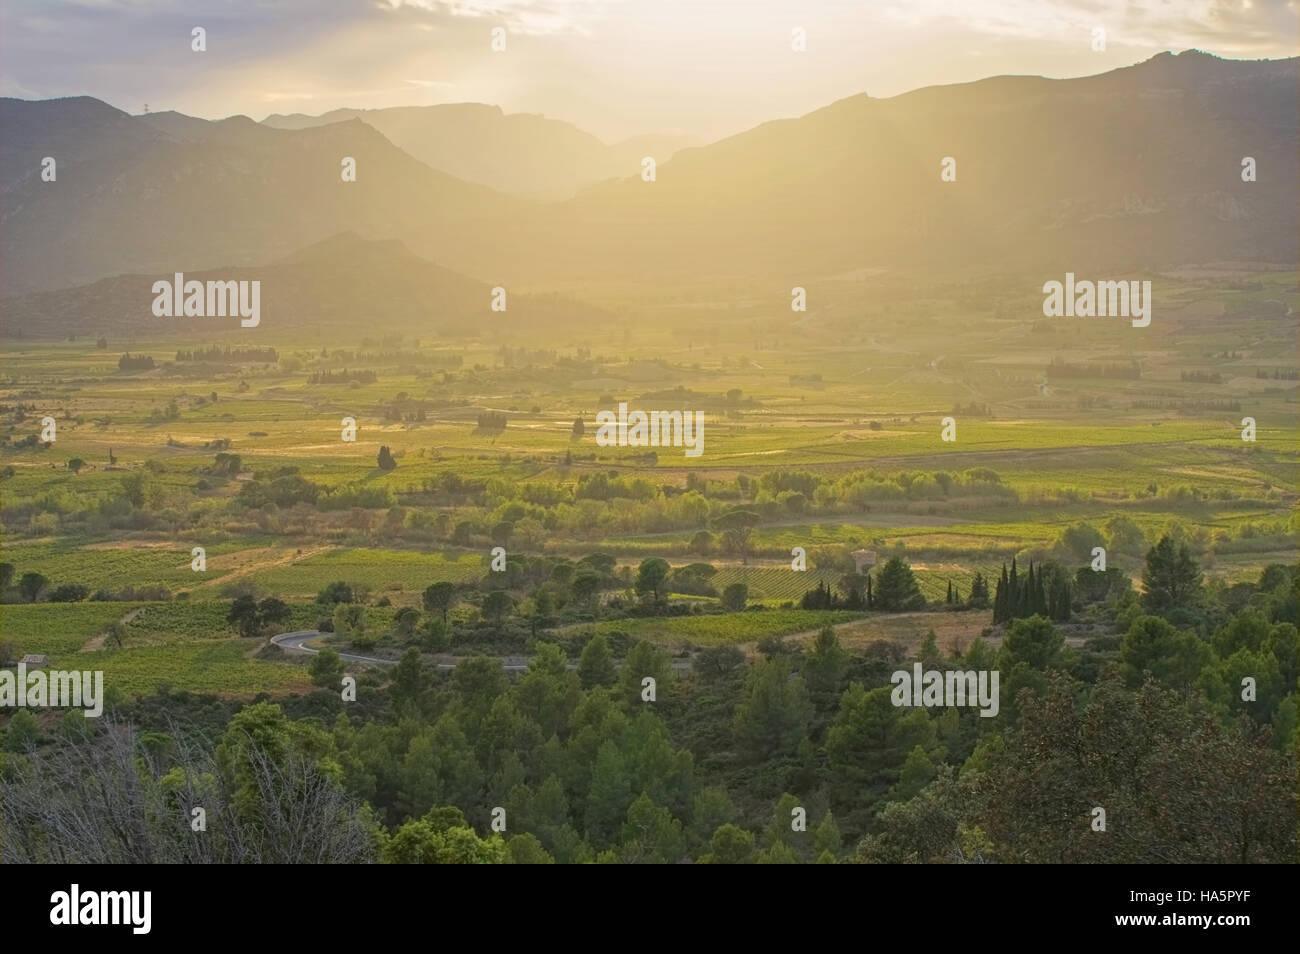 Corbieres Landschaft im Süden Frankreichs - Corbieres landscape in southern France Stock Photo